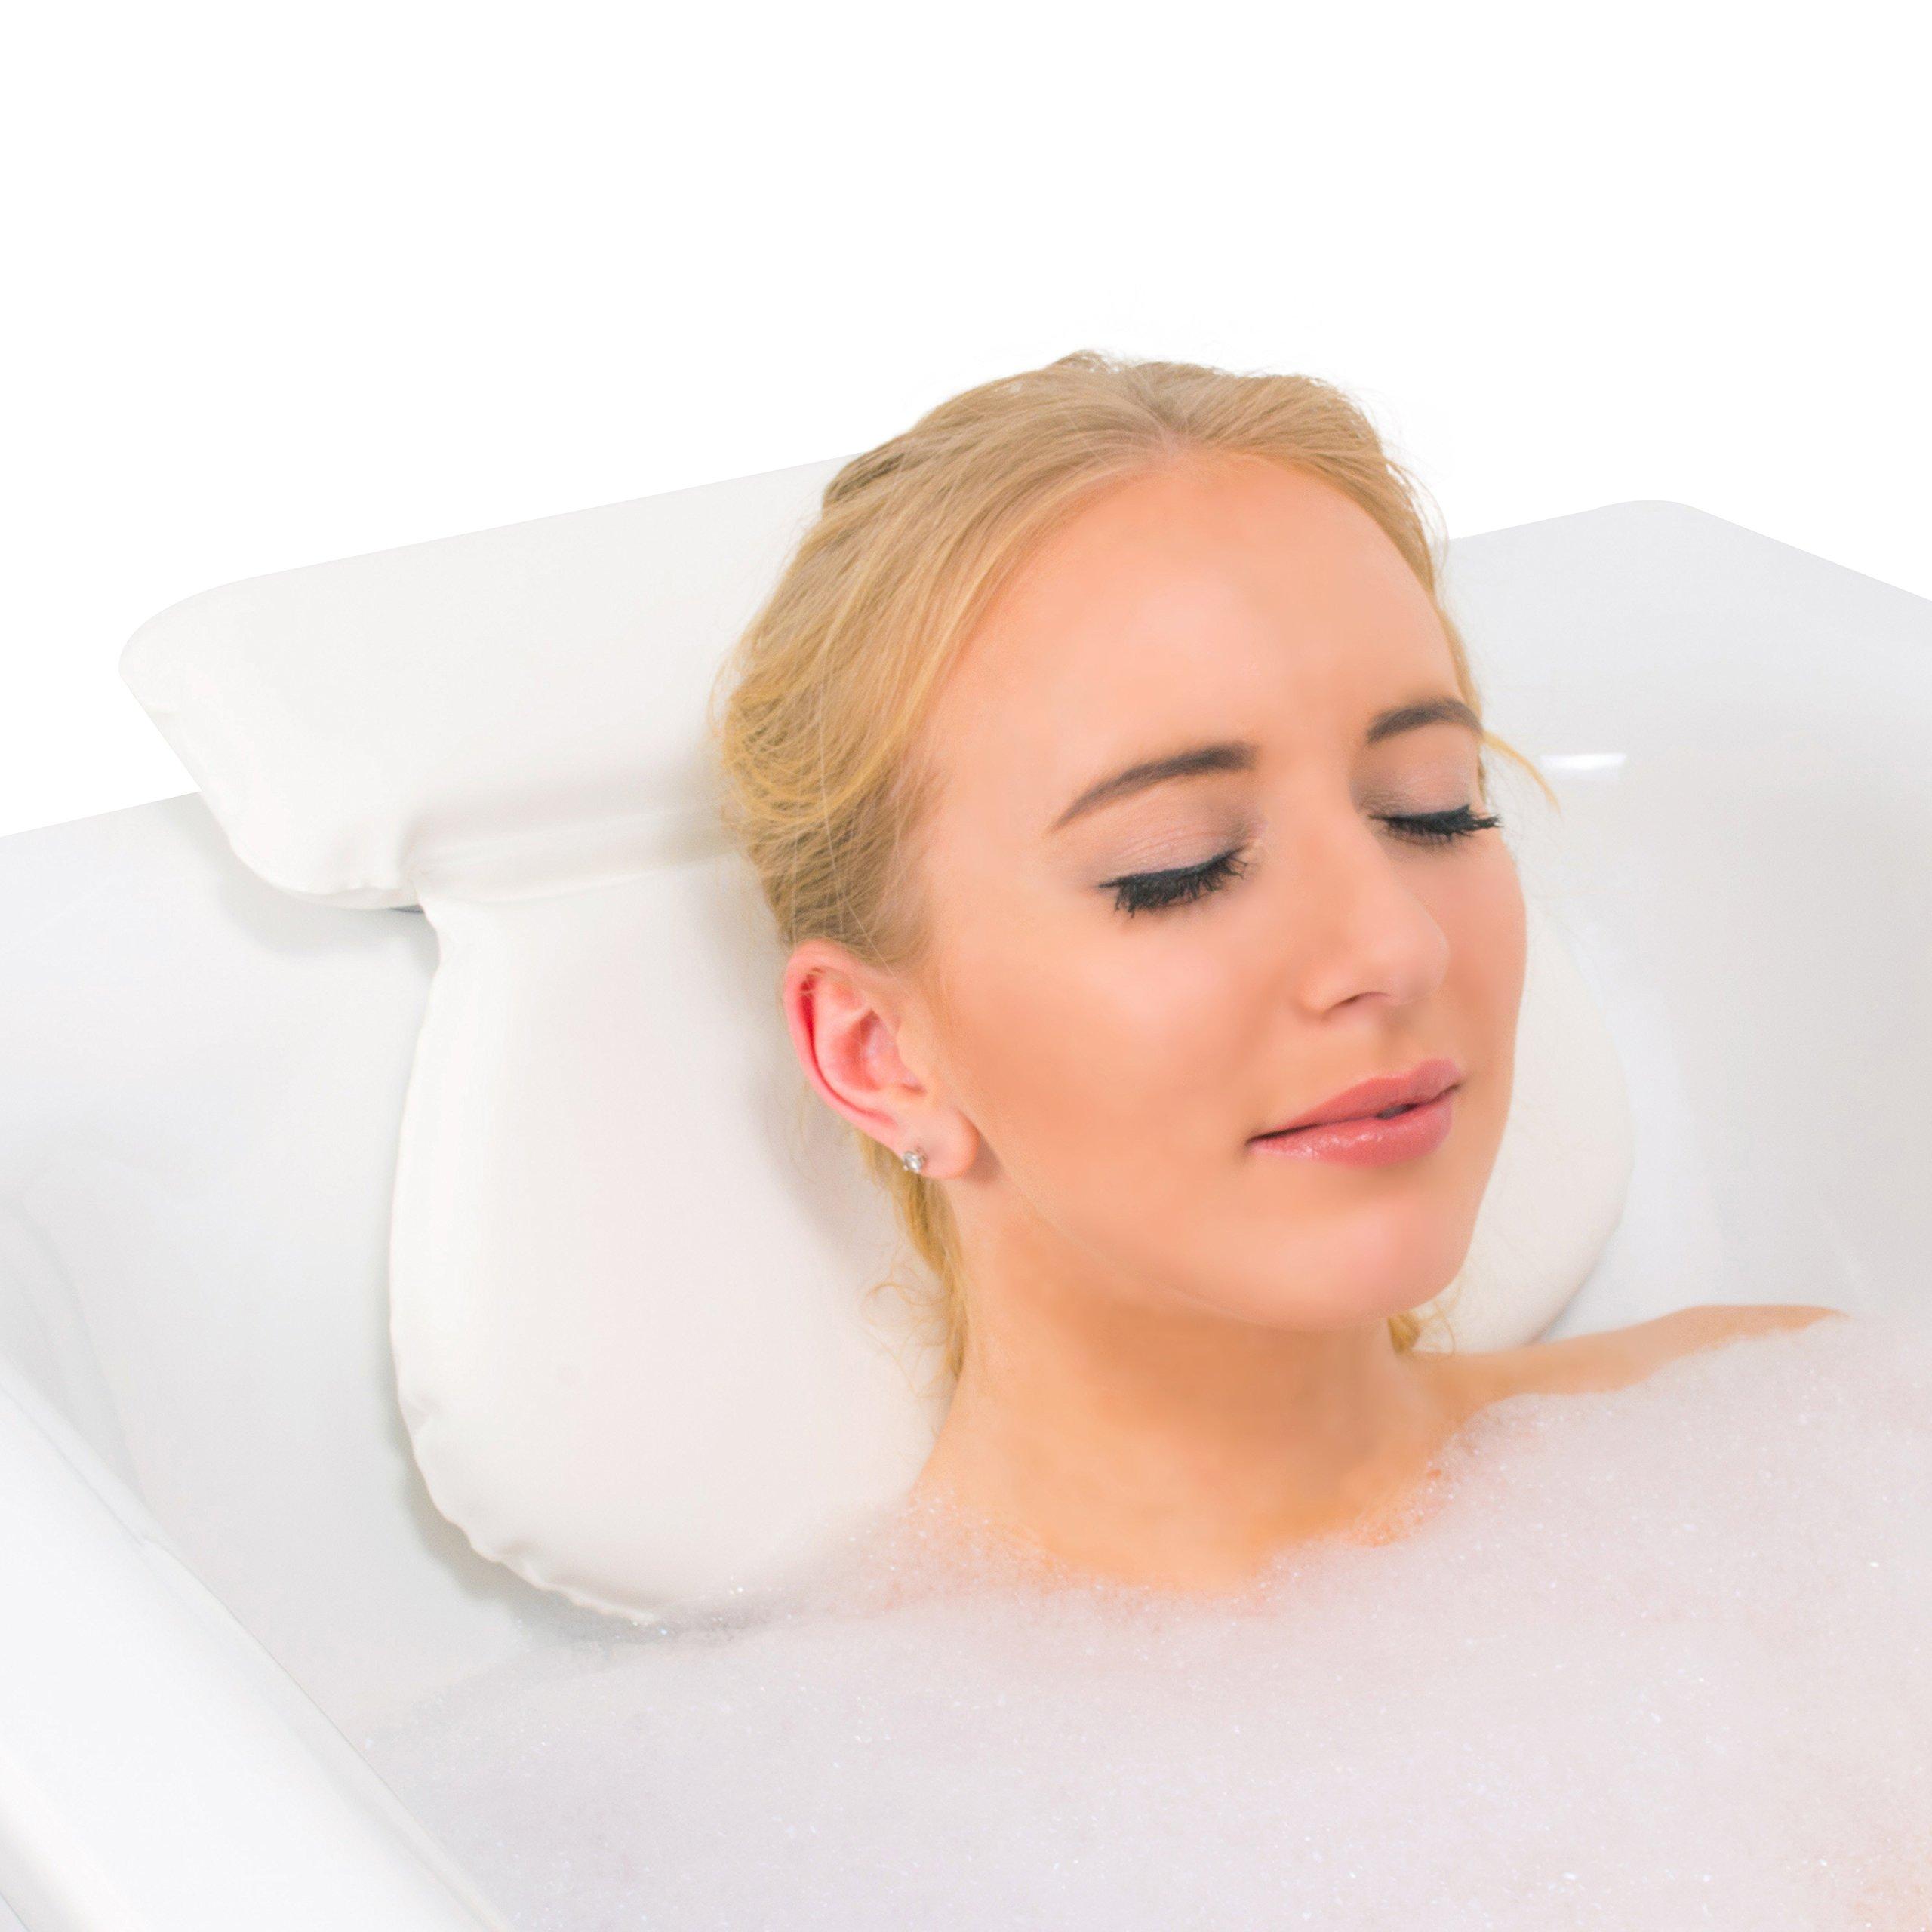 Relux Premium Waterproof Bath Pillow Cushion with Non-Slip Suction Cups Ergonomic Home Spa Headrest